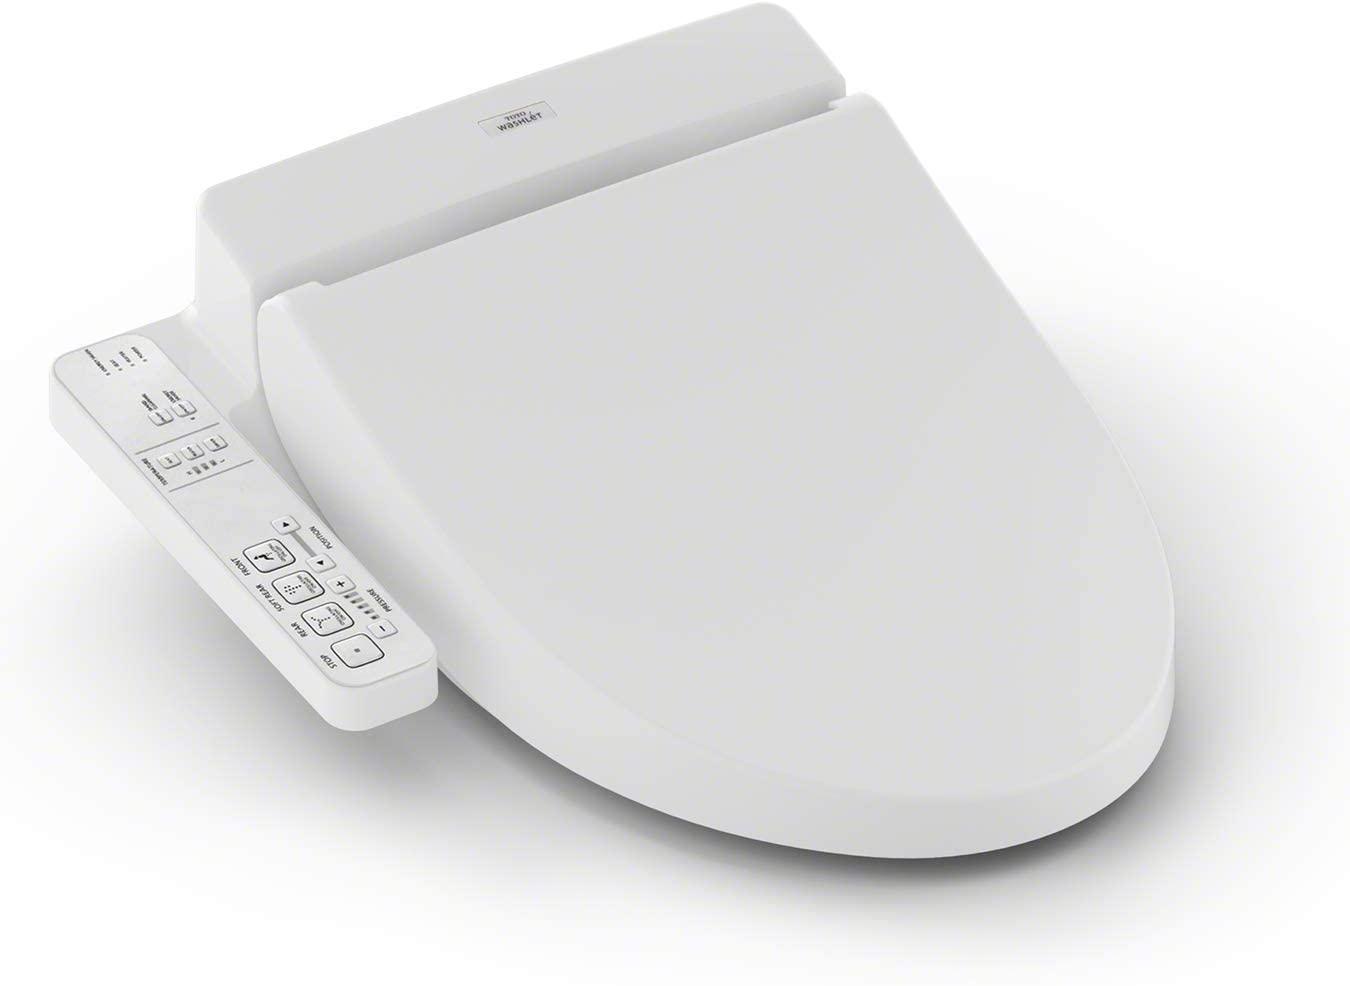 10:TOTO SW2014#01 A100 Electronic Bidet Toilet